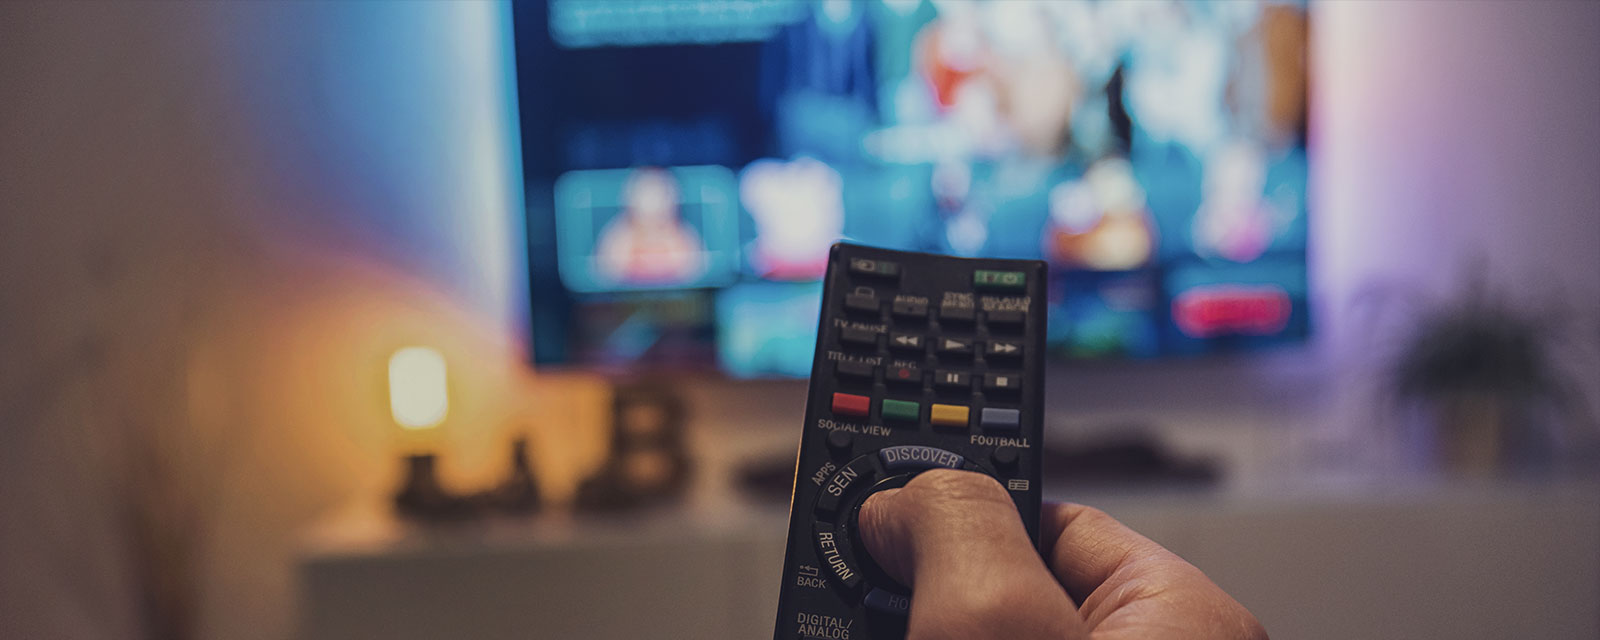 digital terrestrial tv